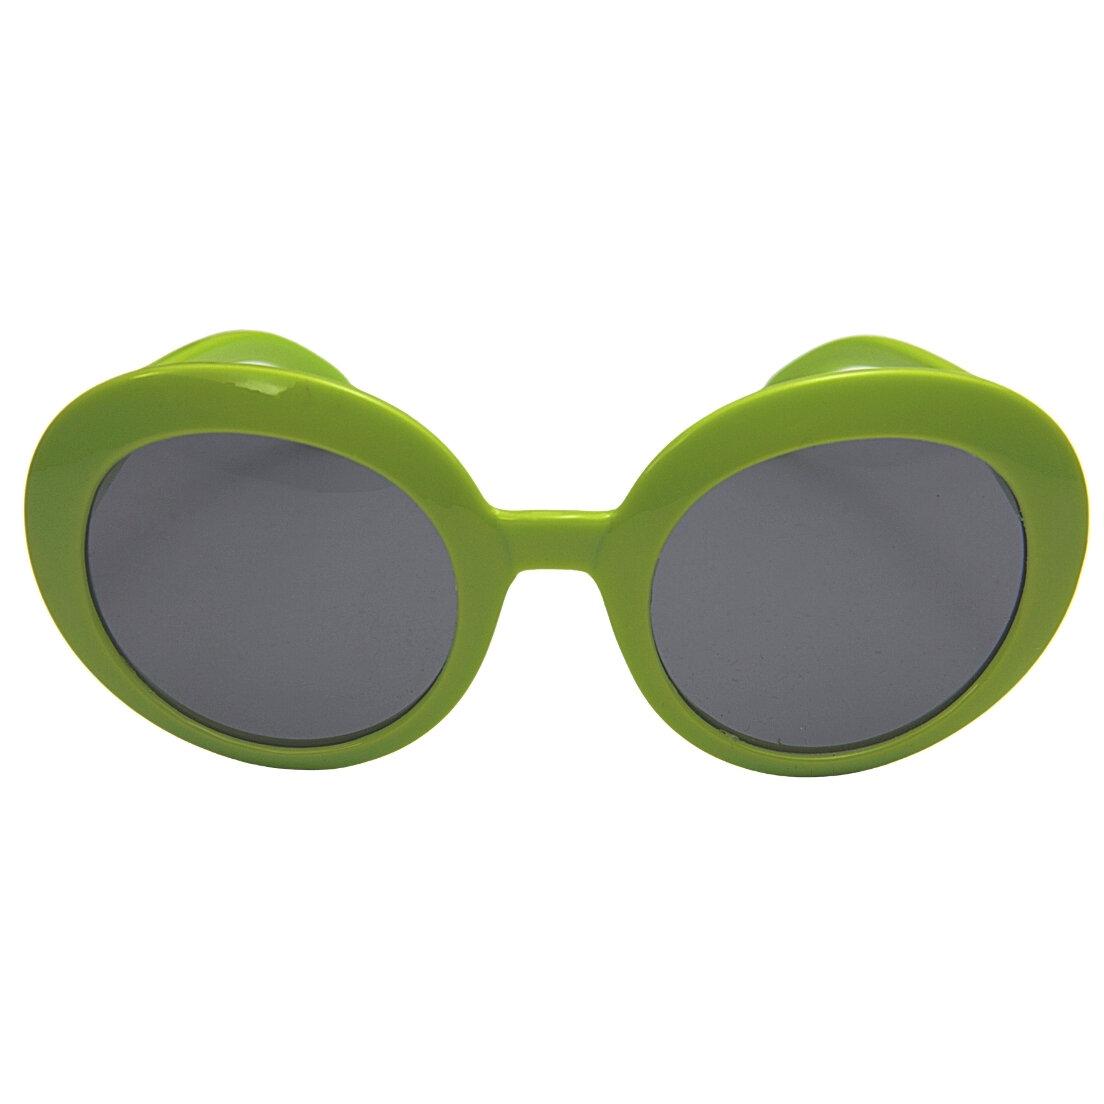 OUTLET - Óculos de Sol Khatto  Kids Retrô Bruninha